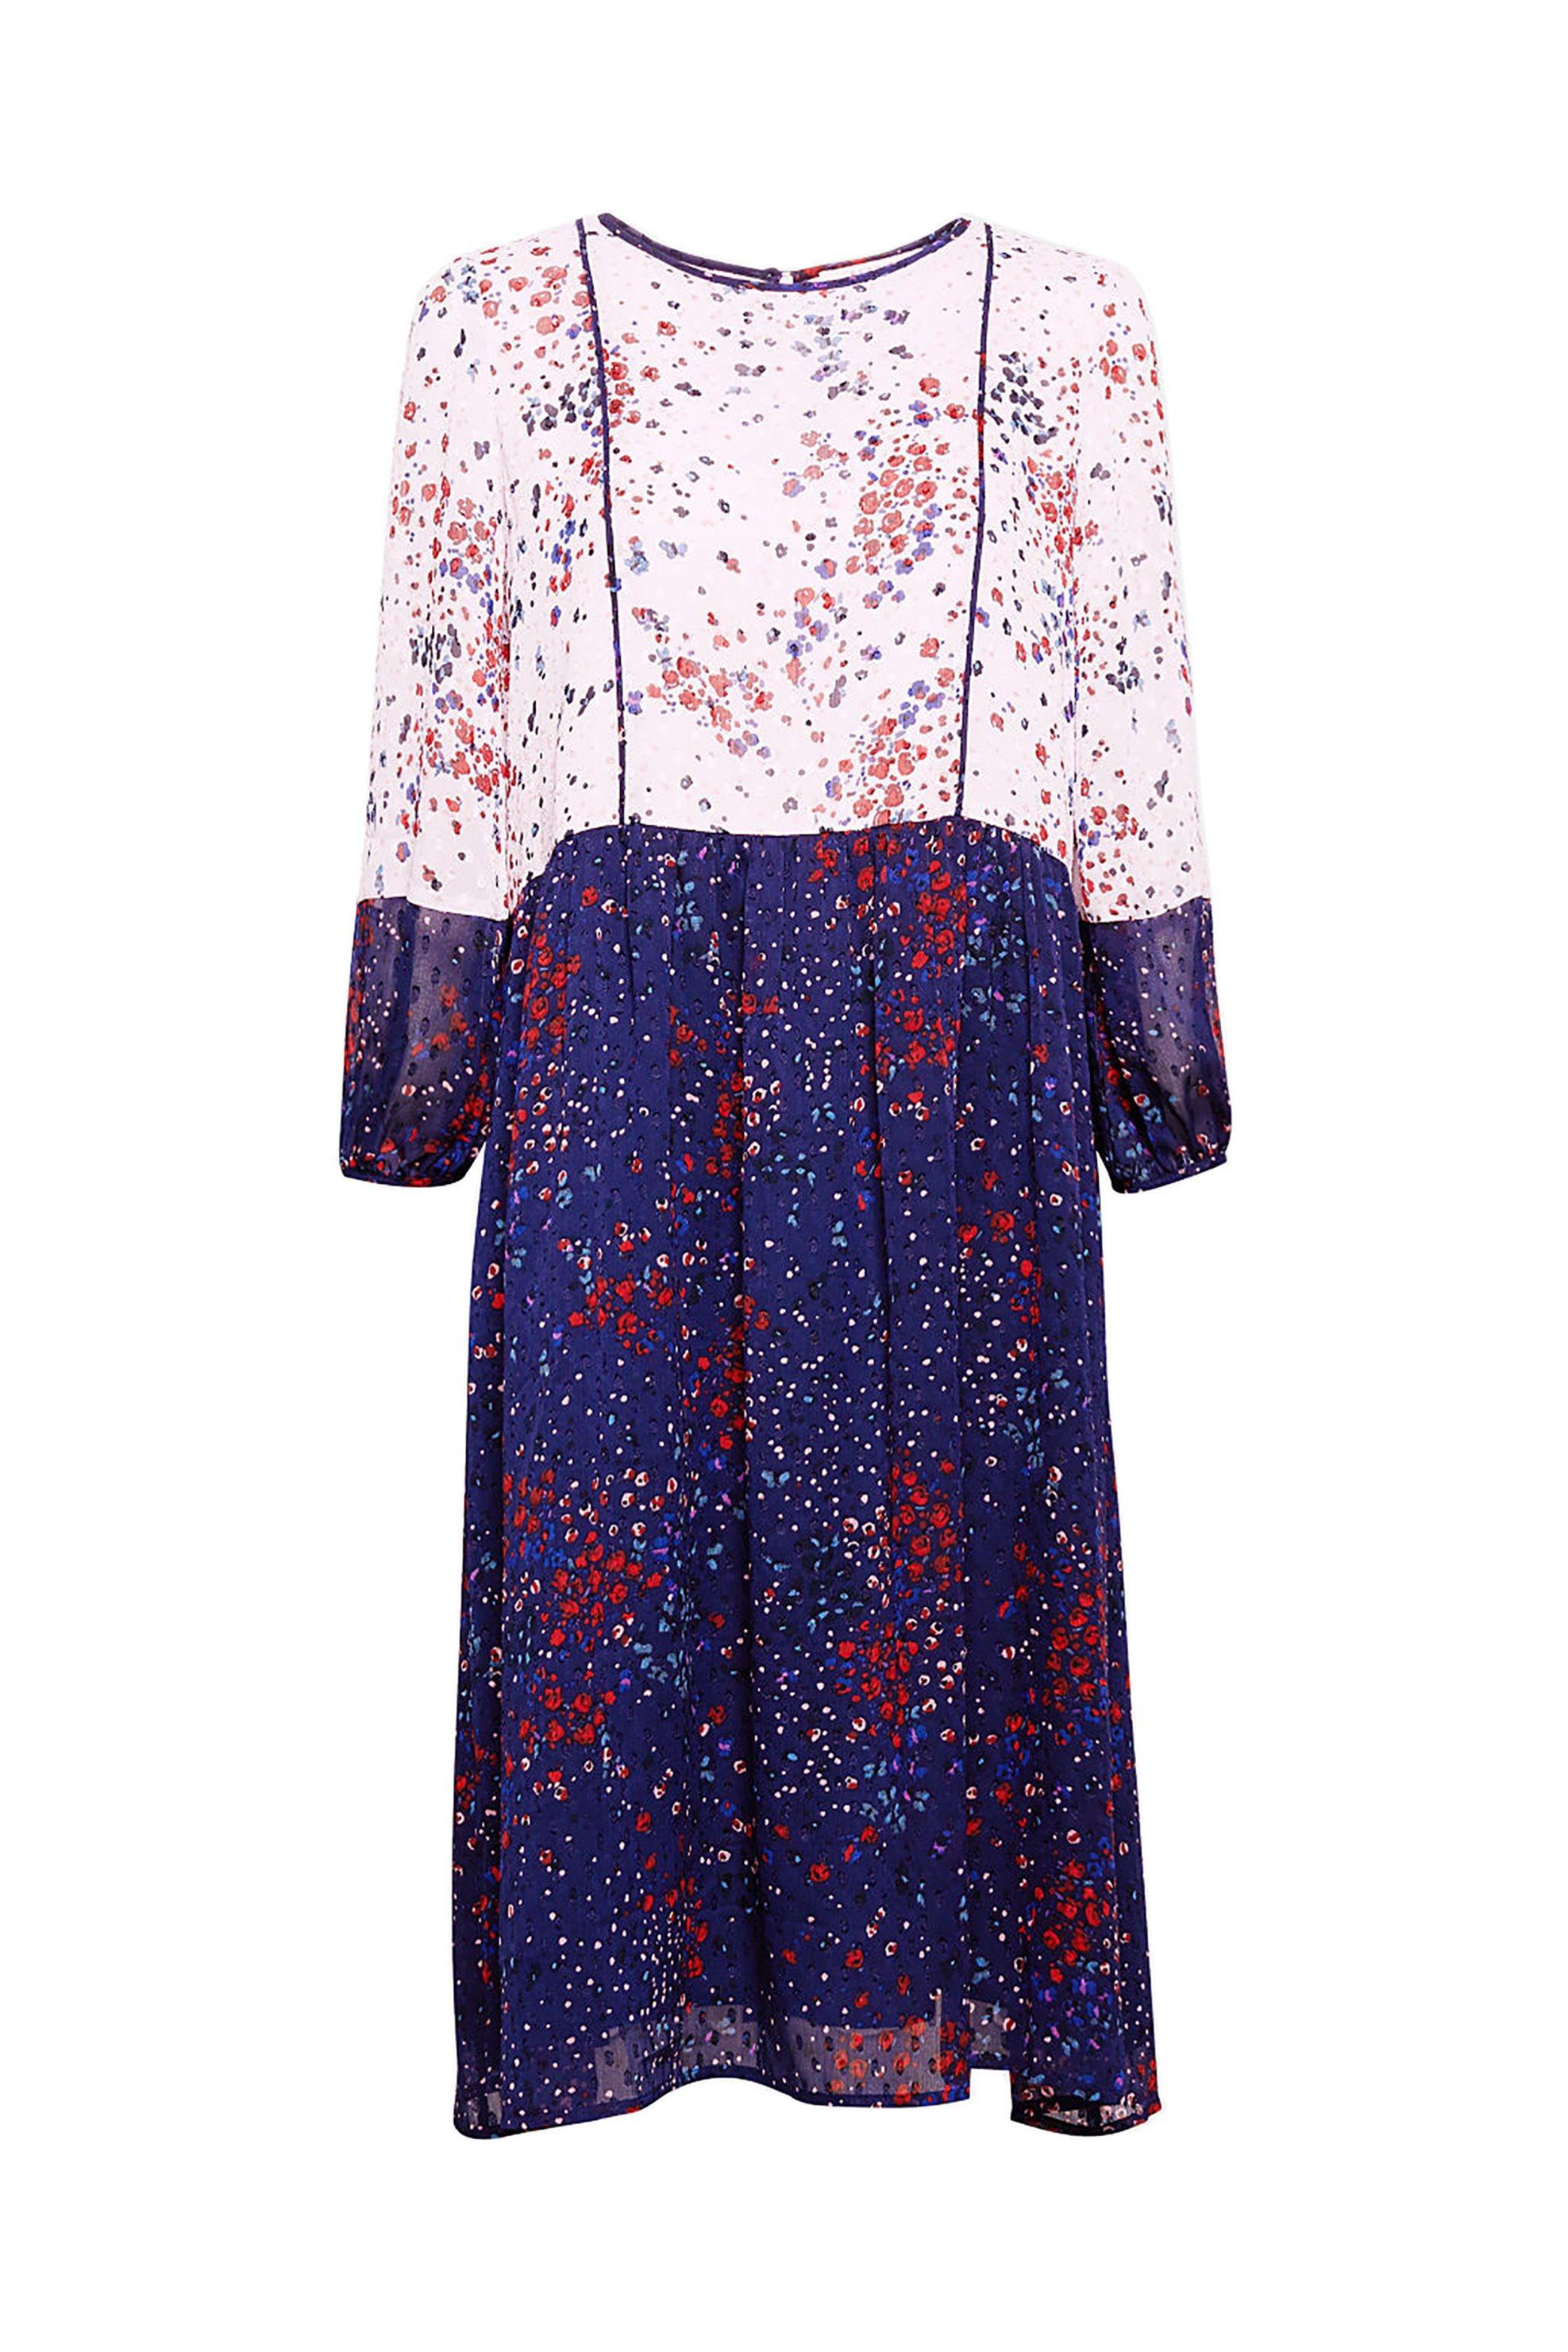 Esprit γυναικείο φόρεμα chiffon με φλοράλ print - 088EE1E019 - Μπλε Σκούρο γυναικα   ρουχα   φορέματα   midi φορέματα